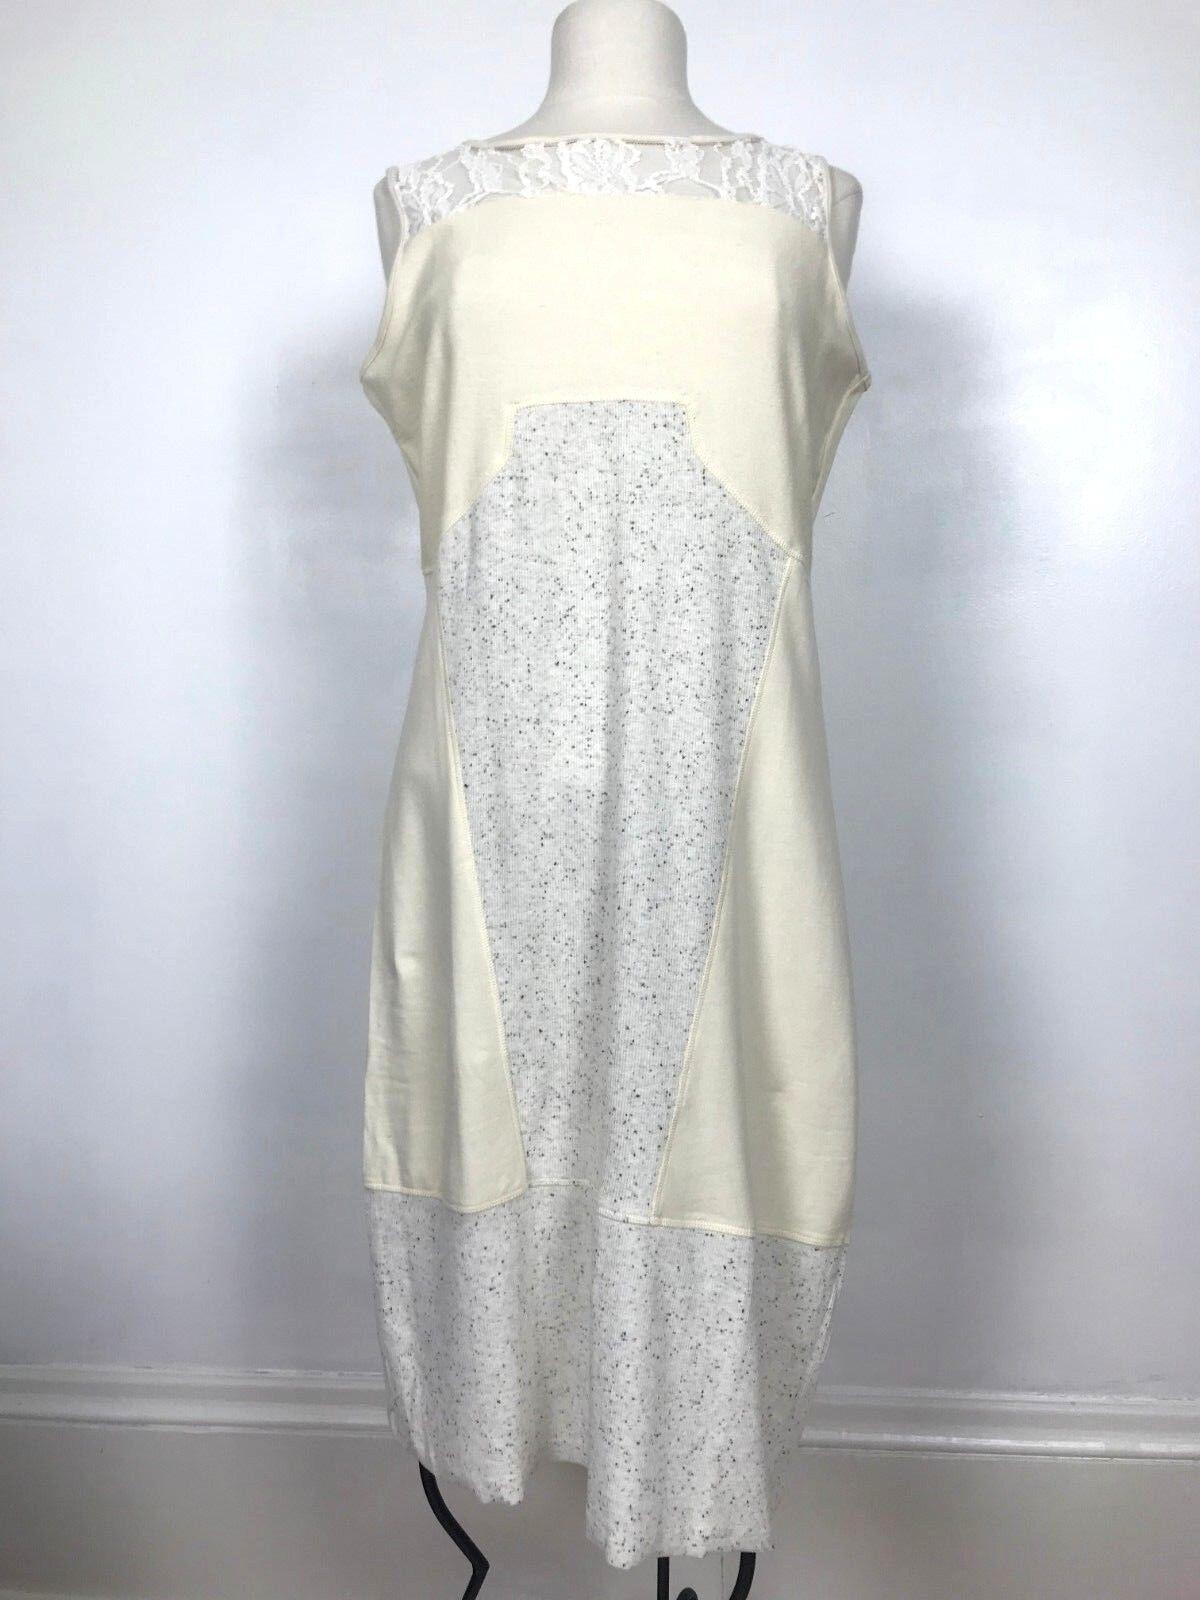 Sundance Catalog Mallorie Dress Dress Dress M Women's Ivory Tank Lace Inset Heather Panels 85e995